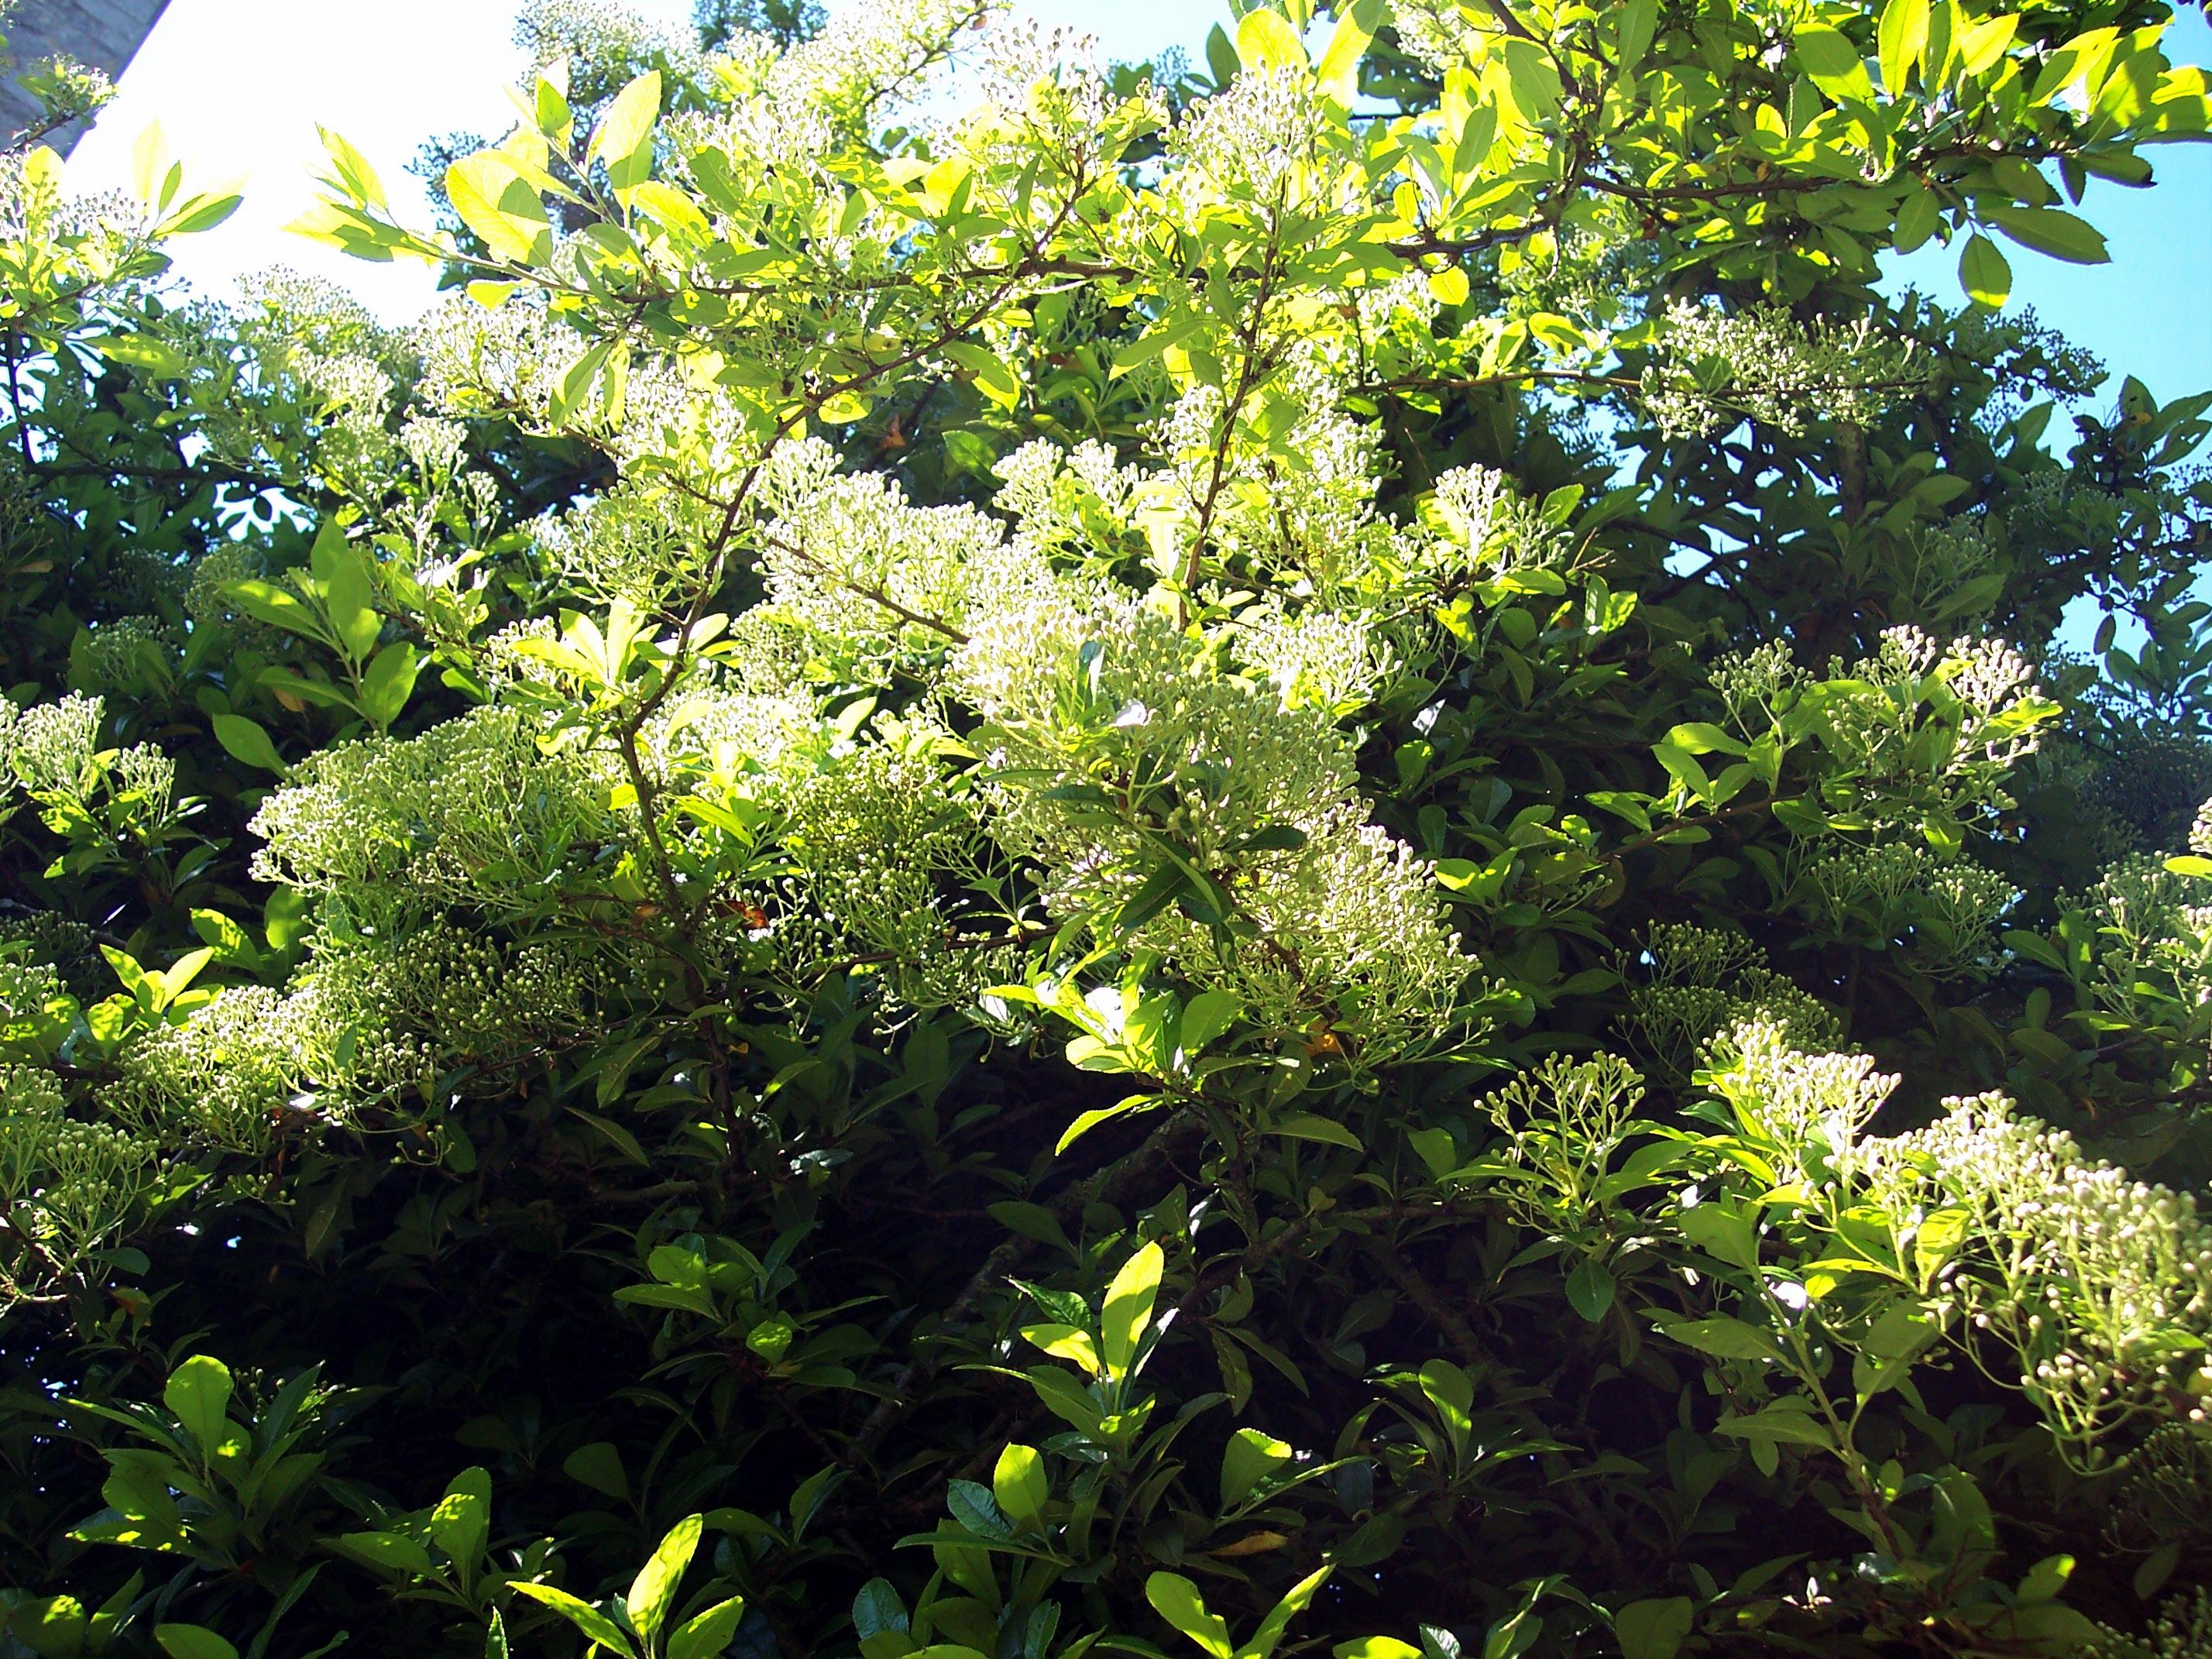 Cockspur Thorn Or Flowering Thron Crataegus Crus Galli Variety Or